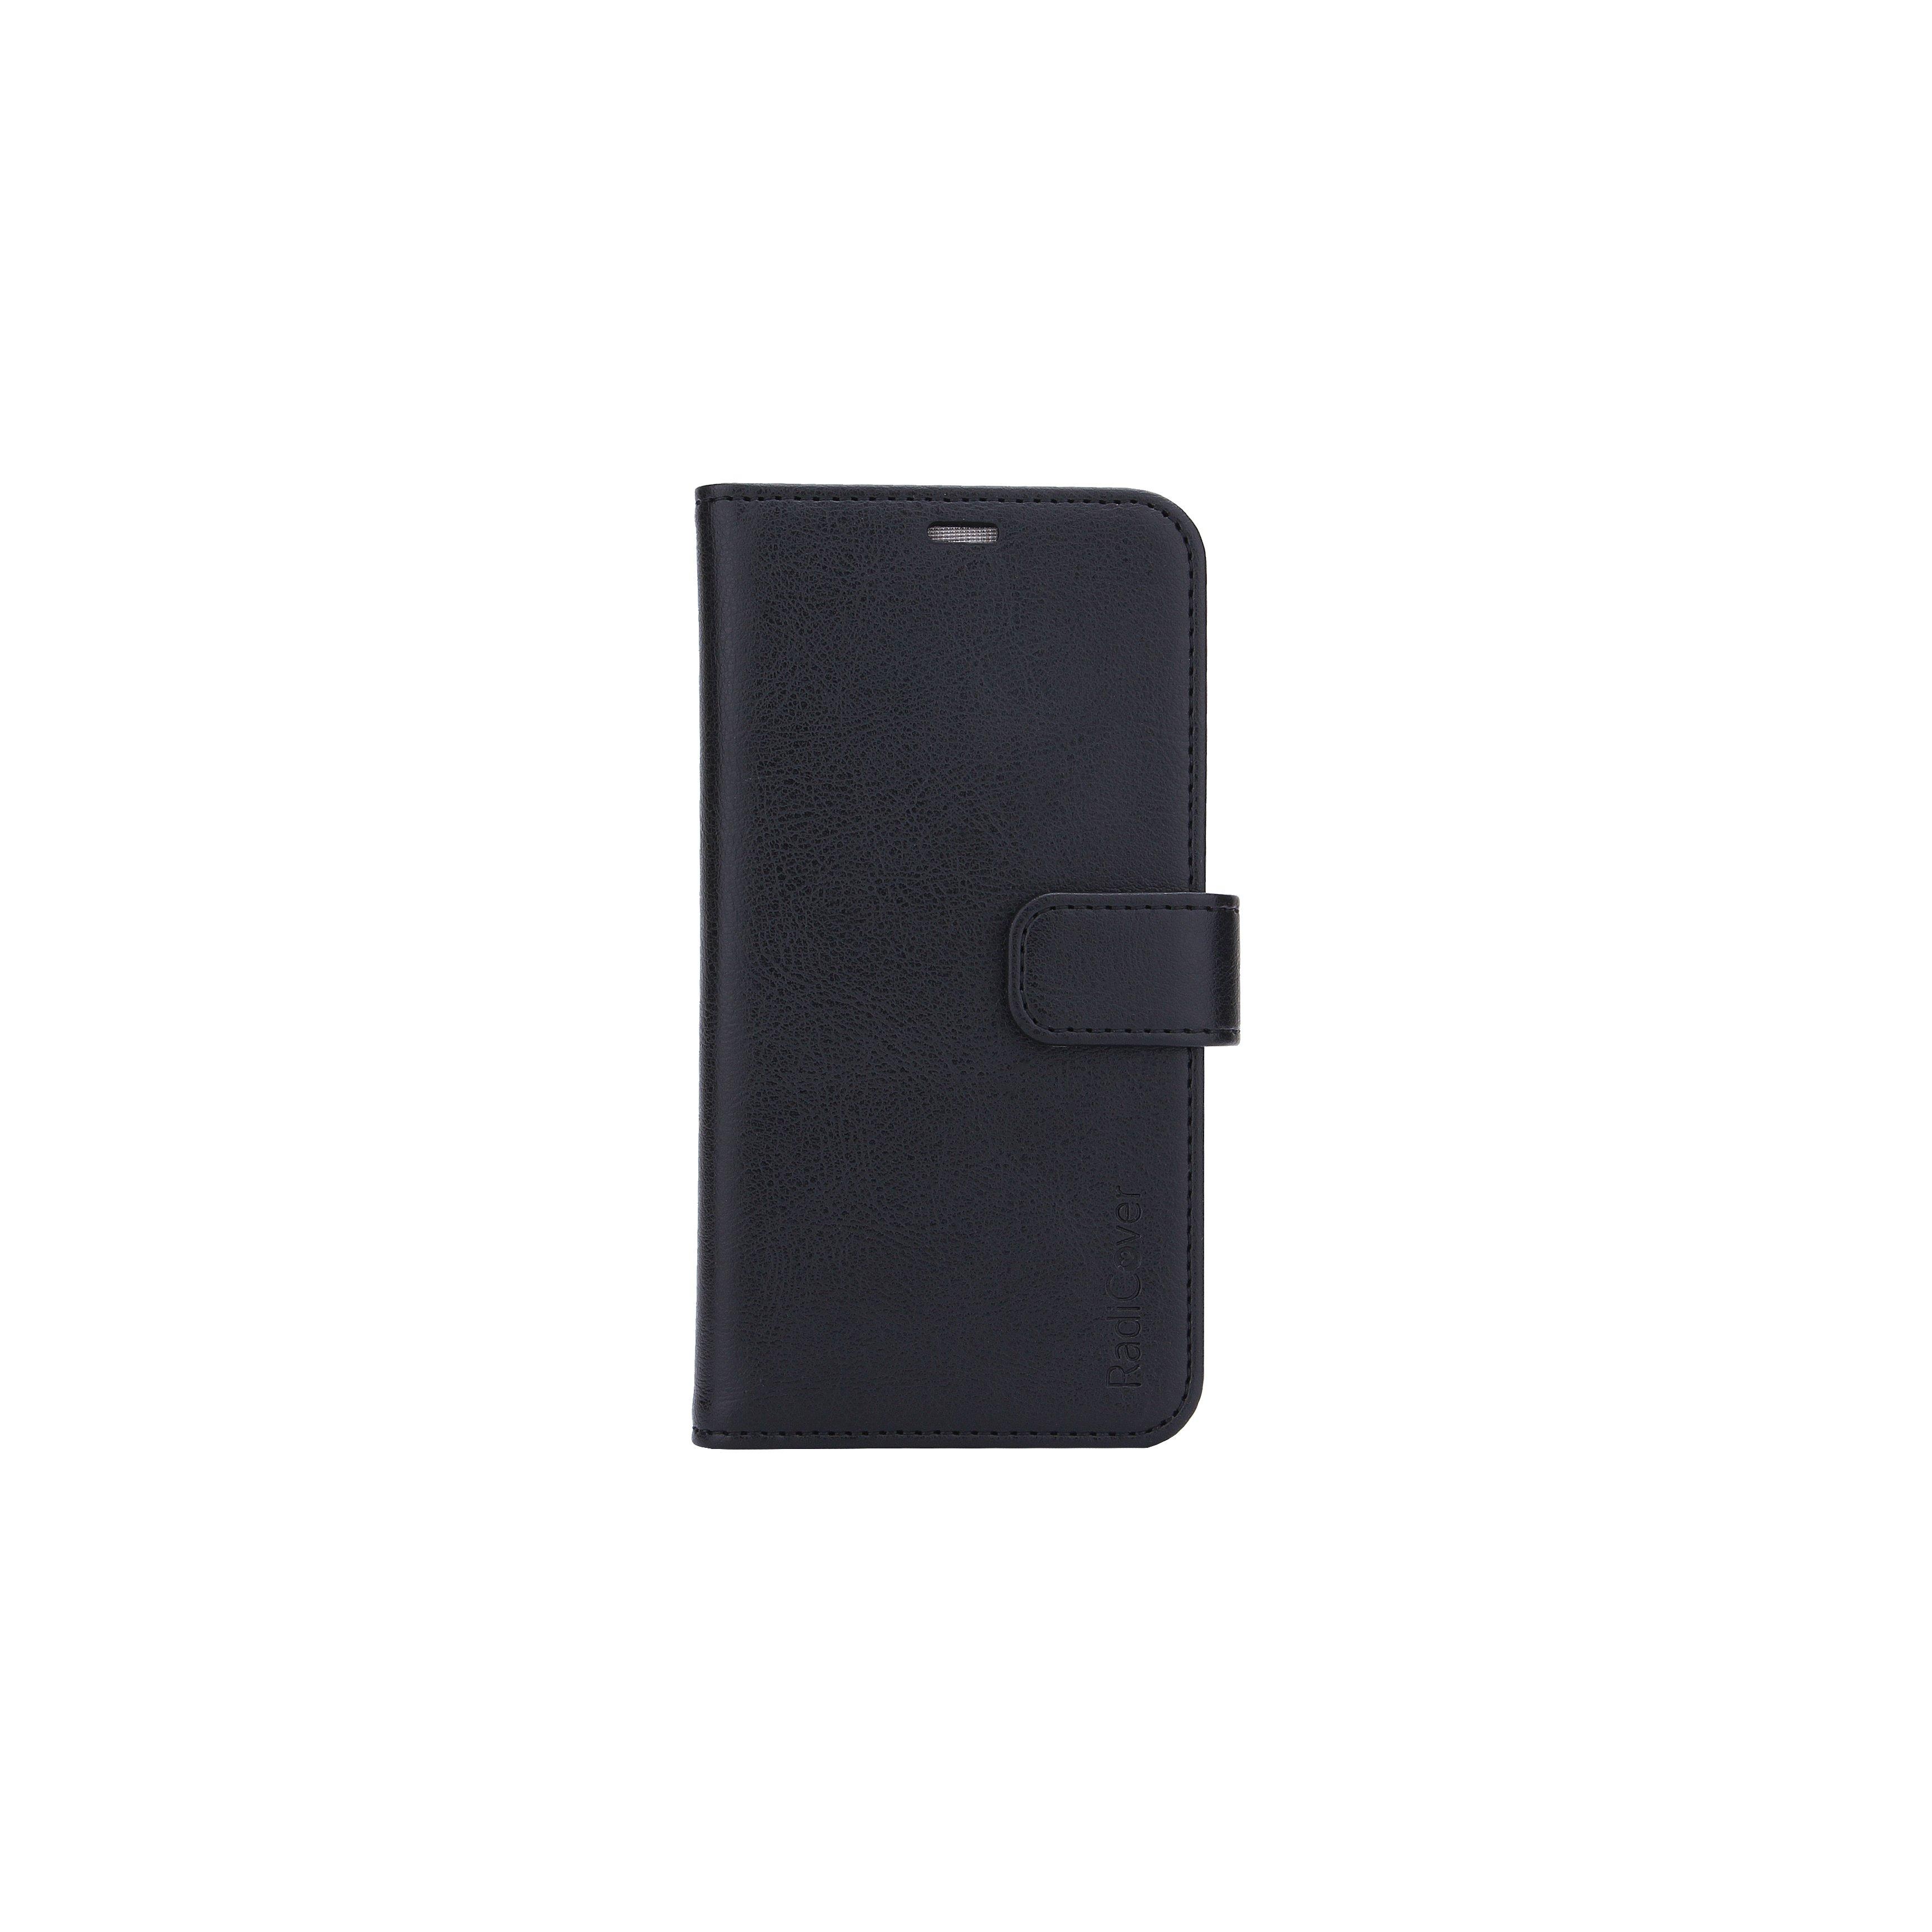 Radicover - Radiationprotected Mobilewallet PU iPhone 11 Pro(3led RFID)